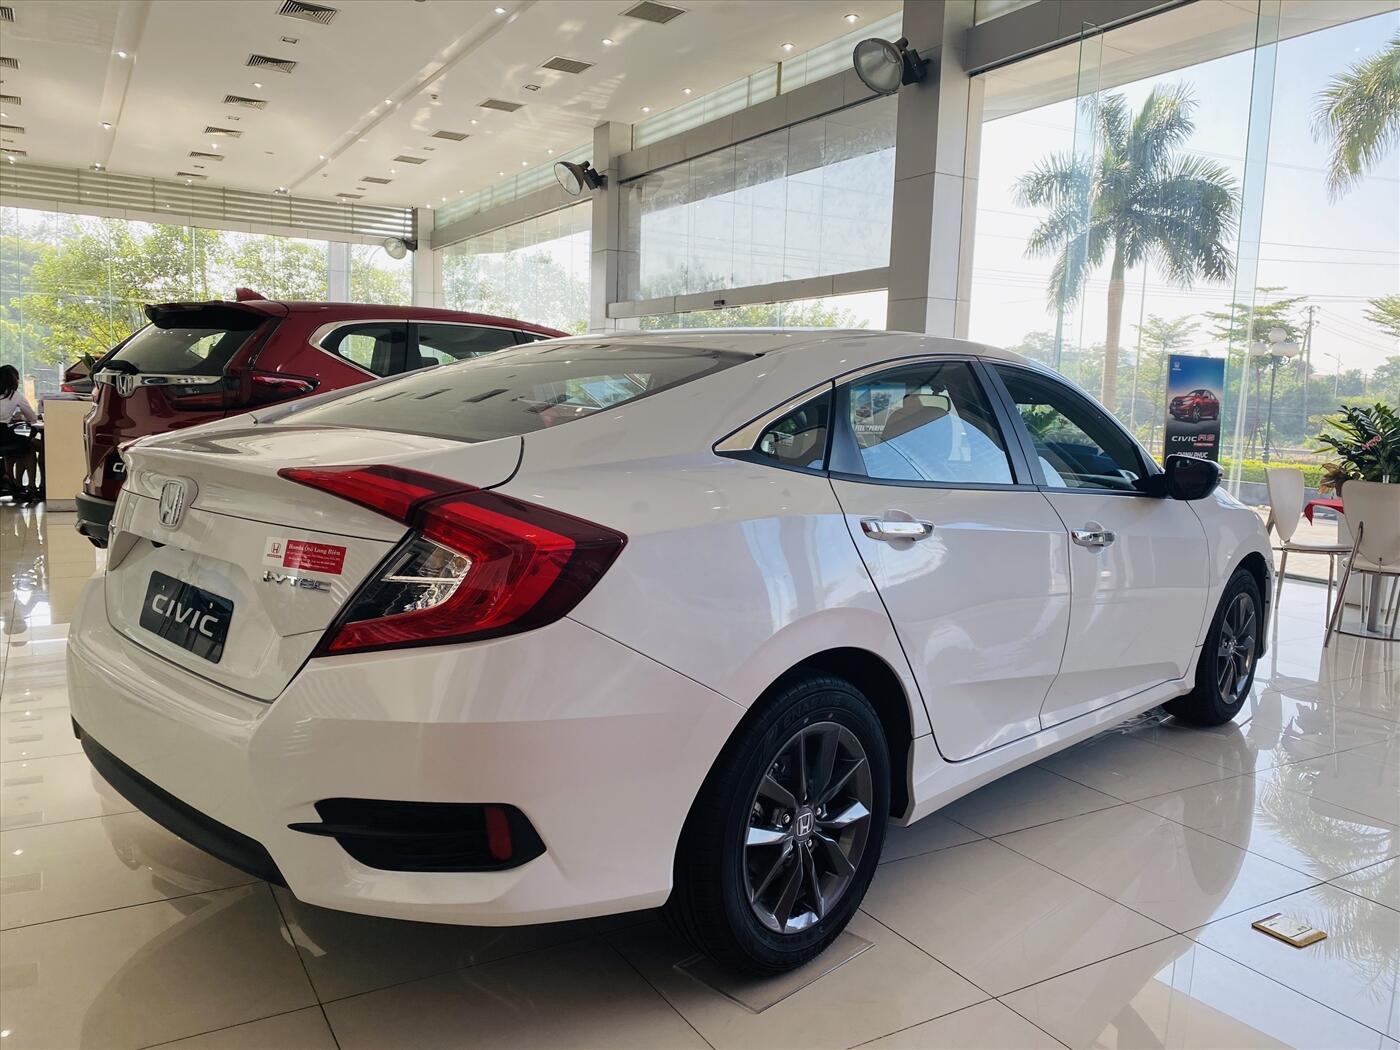 Honda Civic E 1.8L 2021